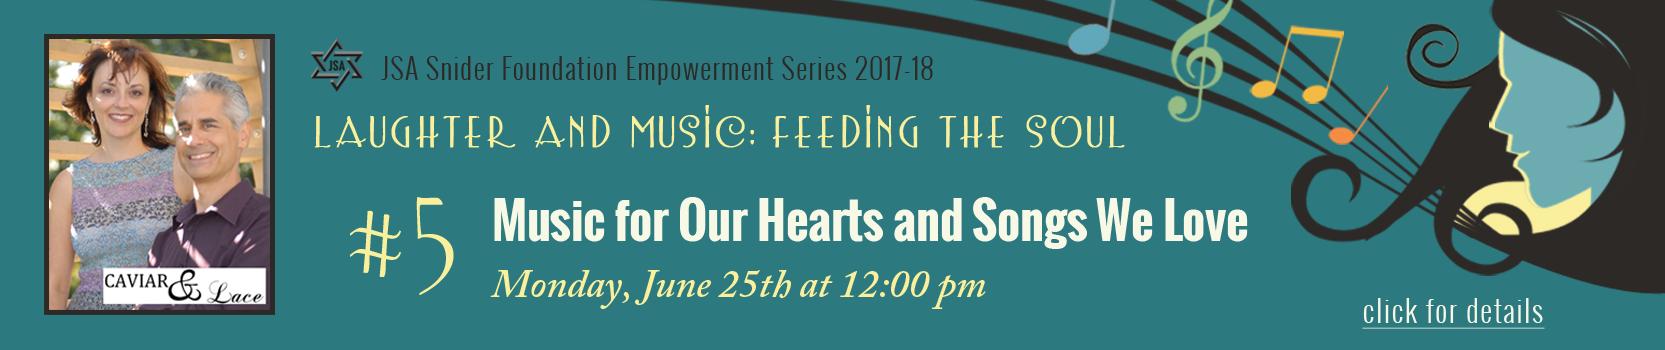 Empowerment-2017-18_5_Details